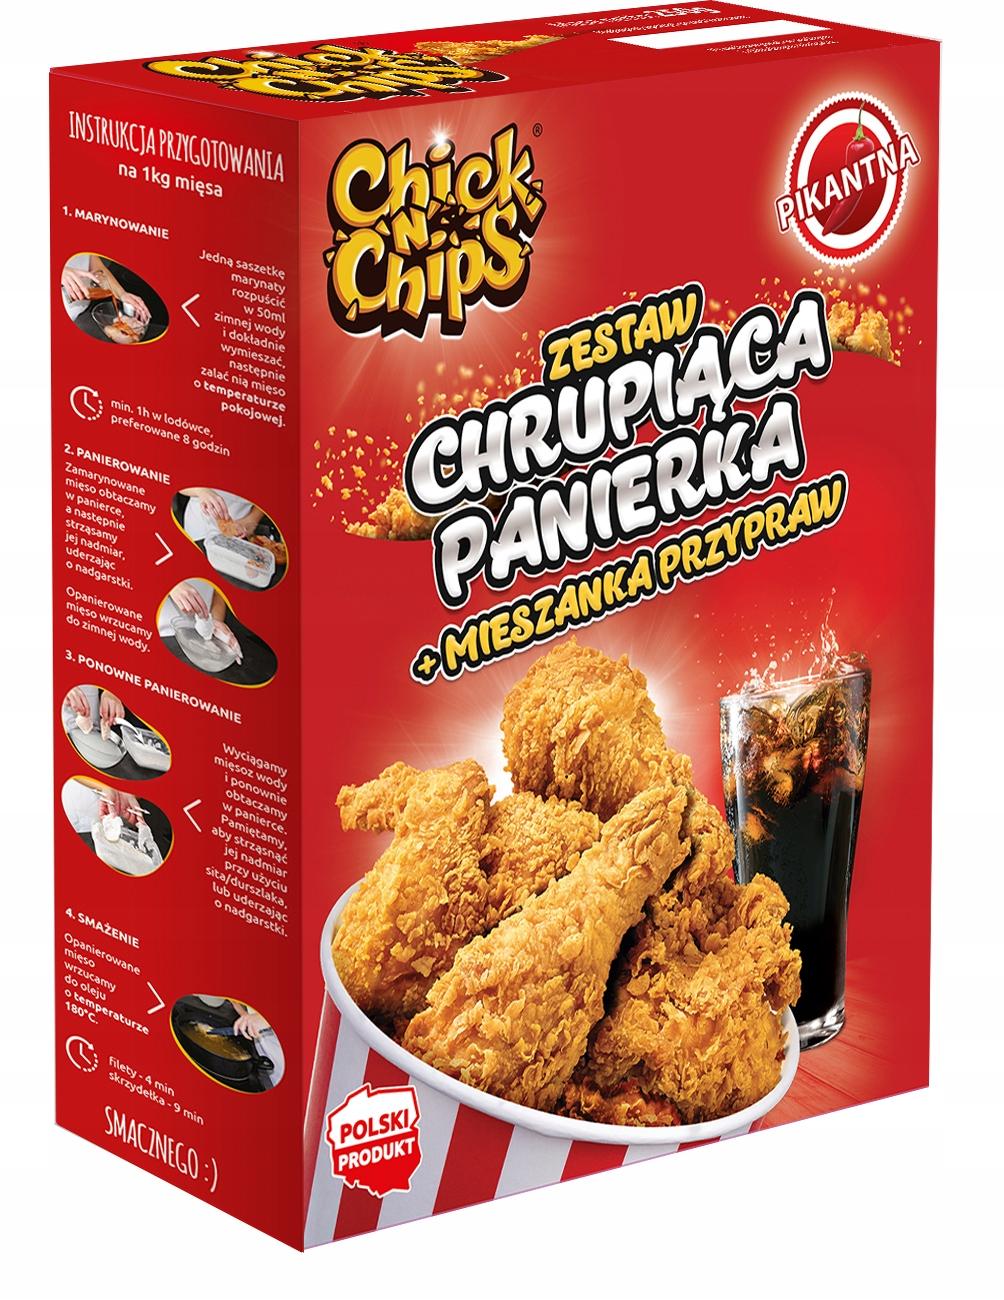 Набор: панировочные сухари Chick'n'chips + ОСТРЫЙ маринад